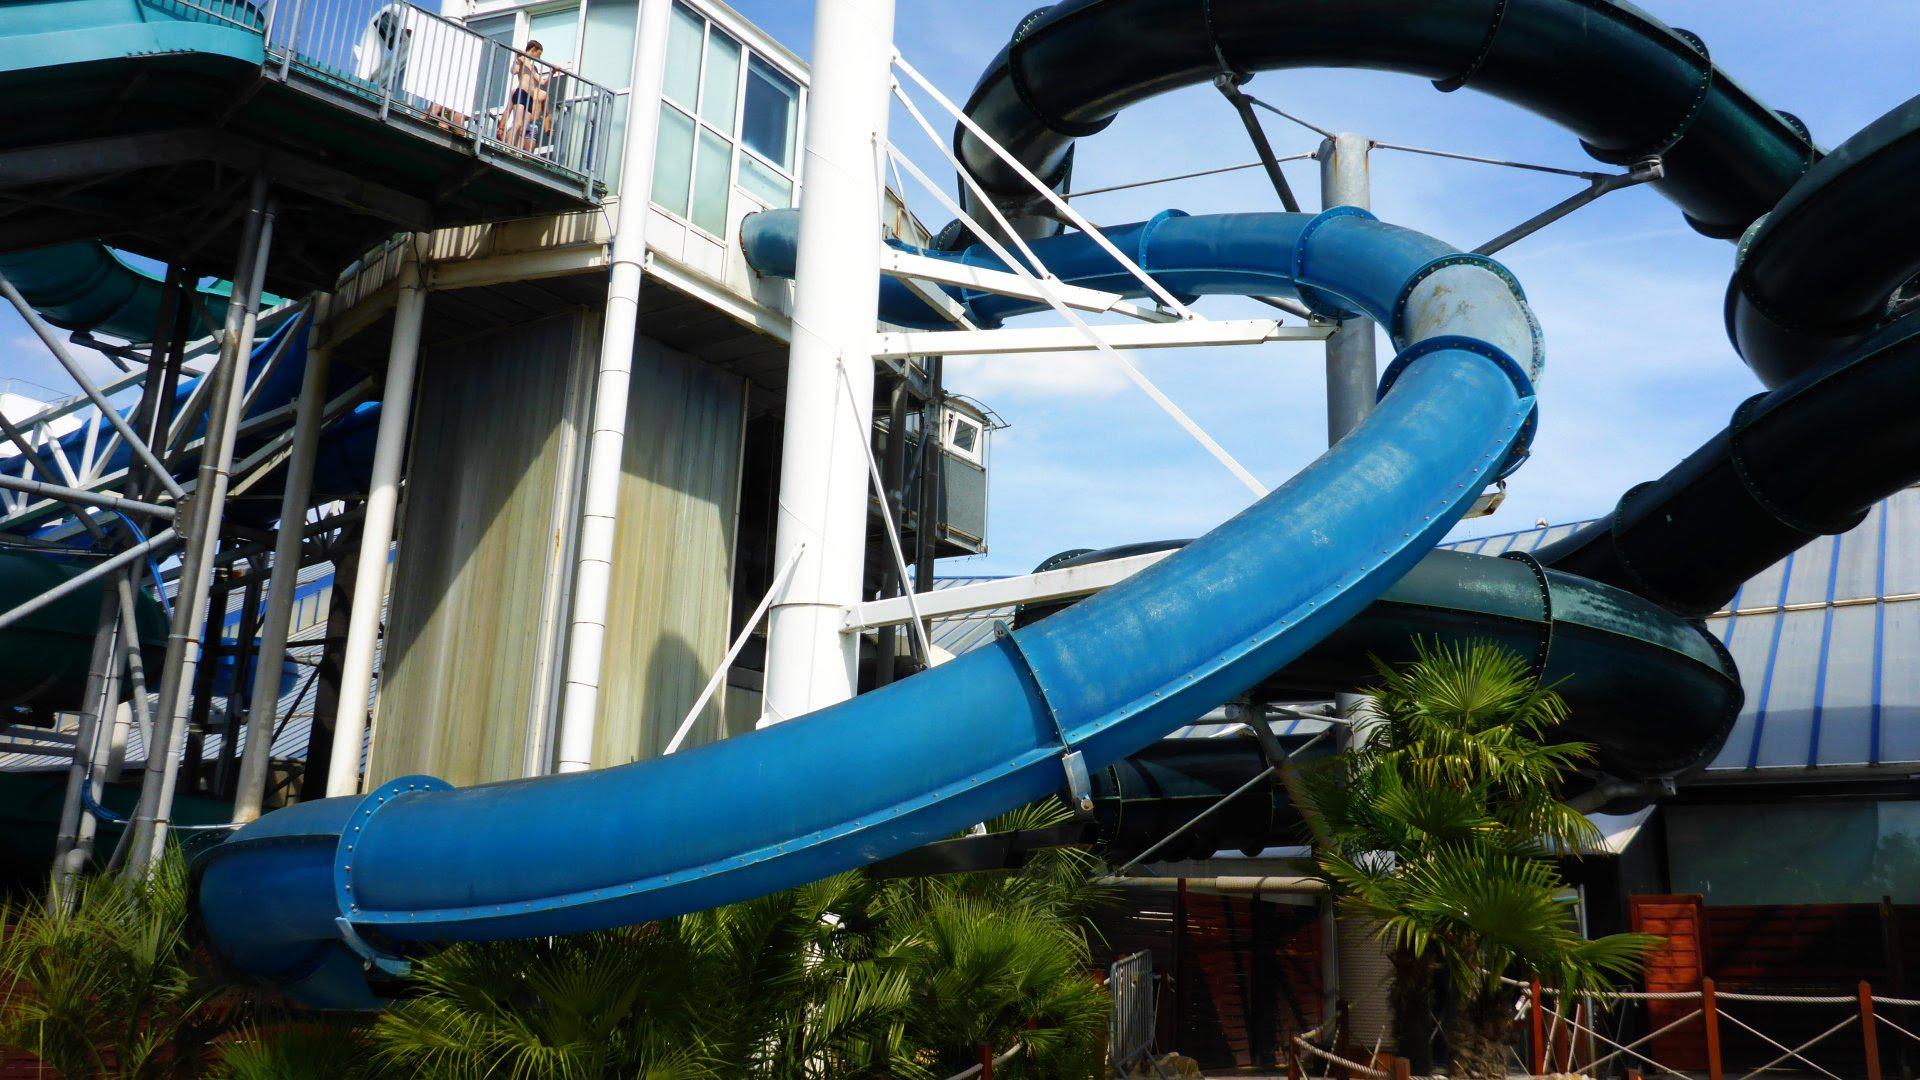 Aqualooping Turborutsche - Speed Slide | Aquaboulevard Paris